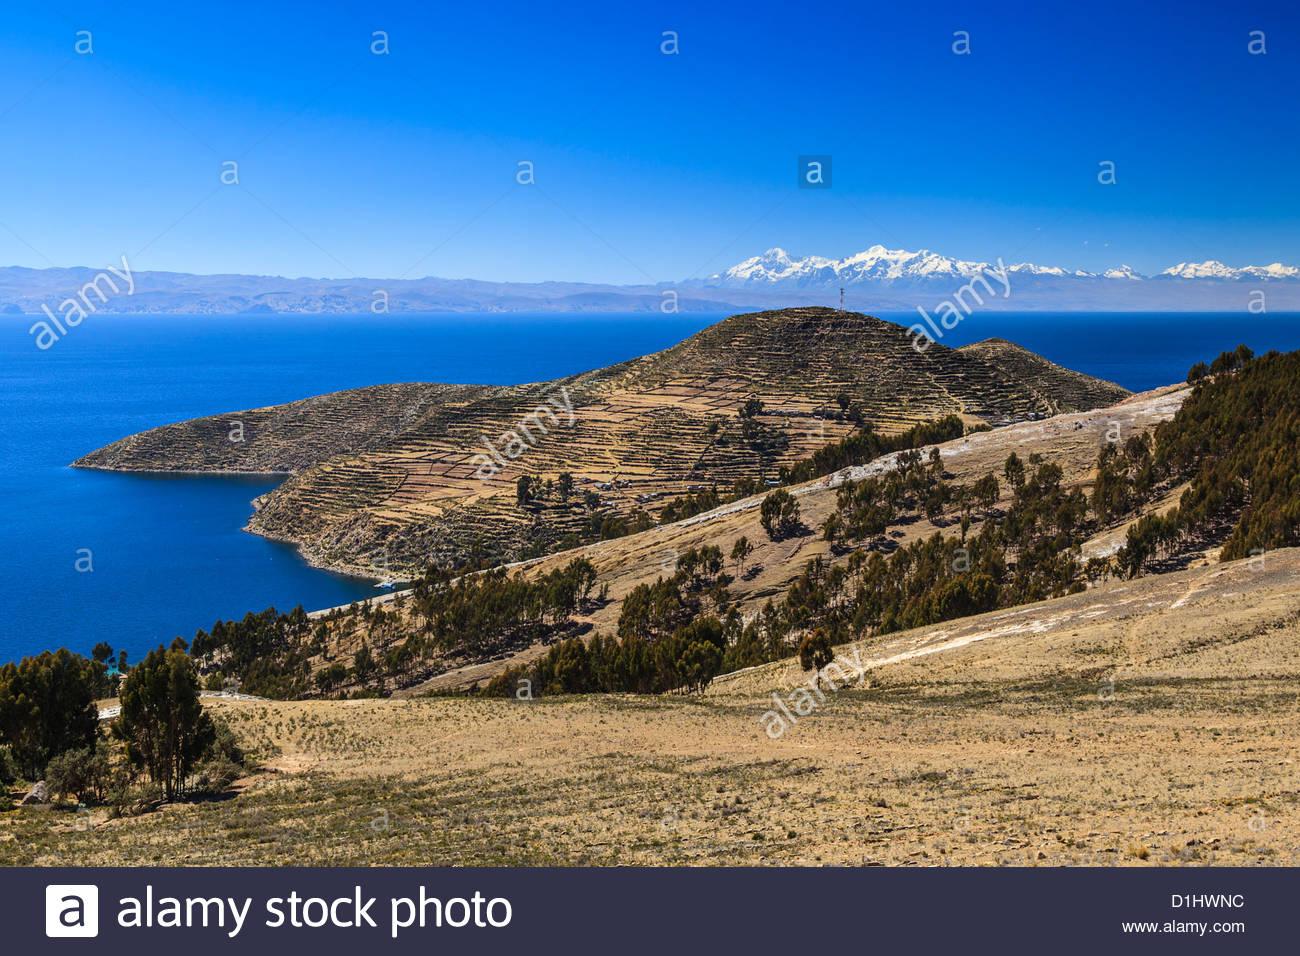 Isla del Sol on the Bolivian Side of Lake Titicaca, Bolivia - Stock Image